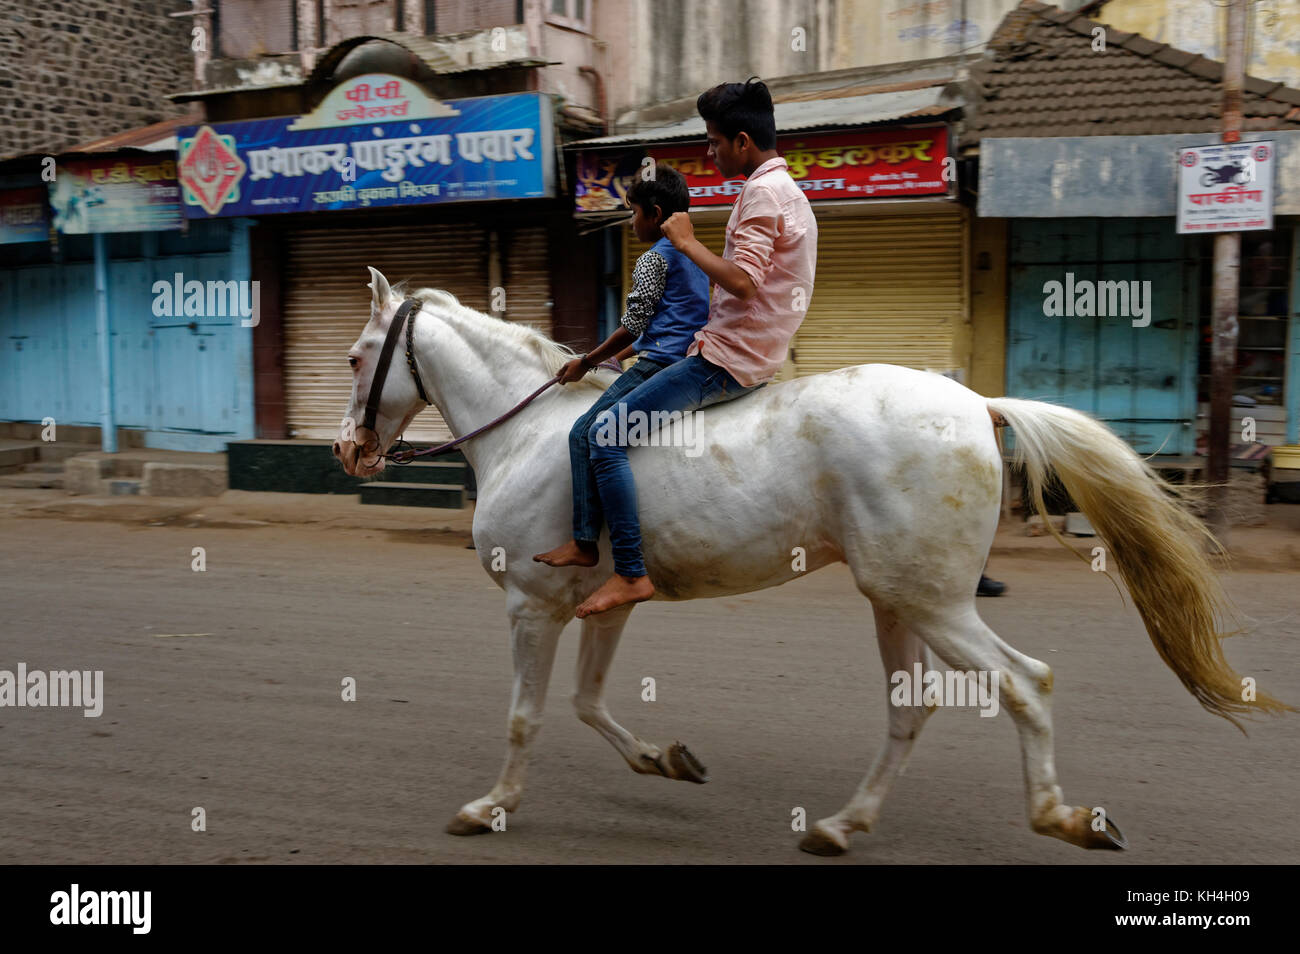 Jungen zu Pferd, miraj, Maharashtra, Indien, Asien Stockbild